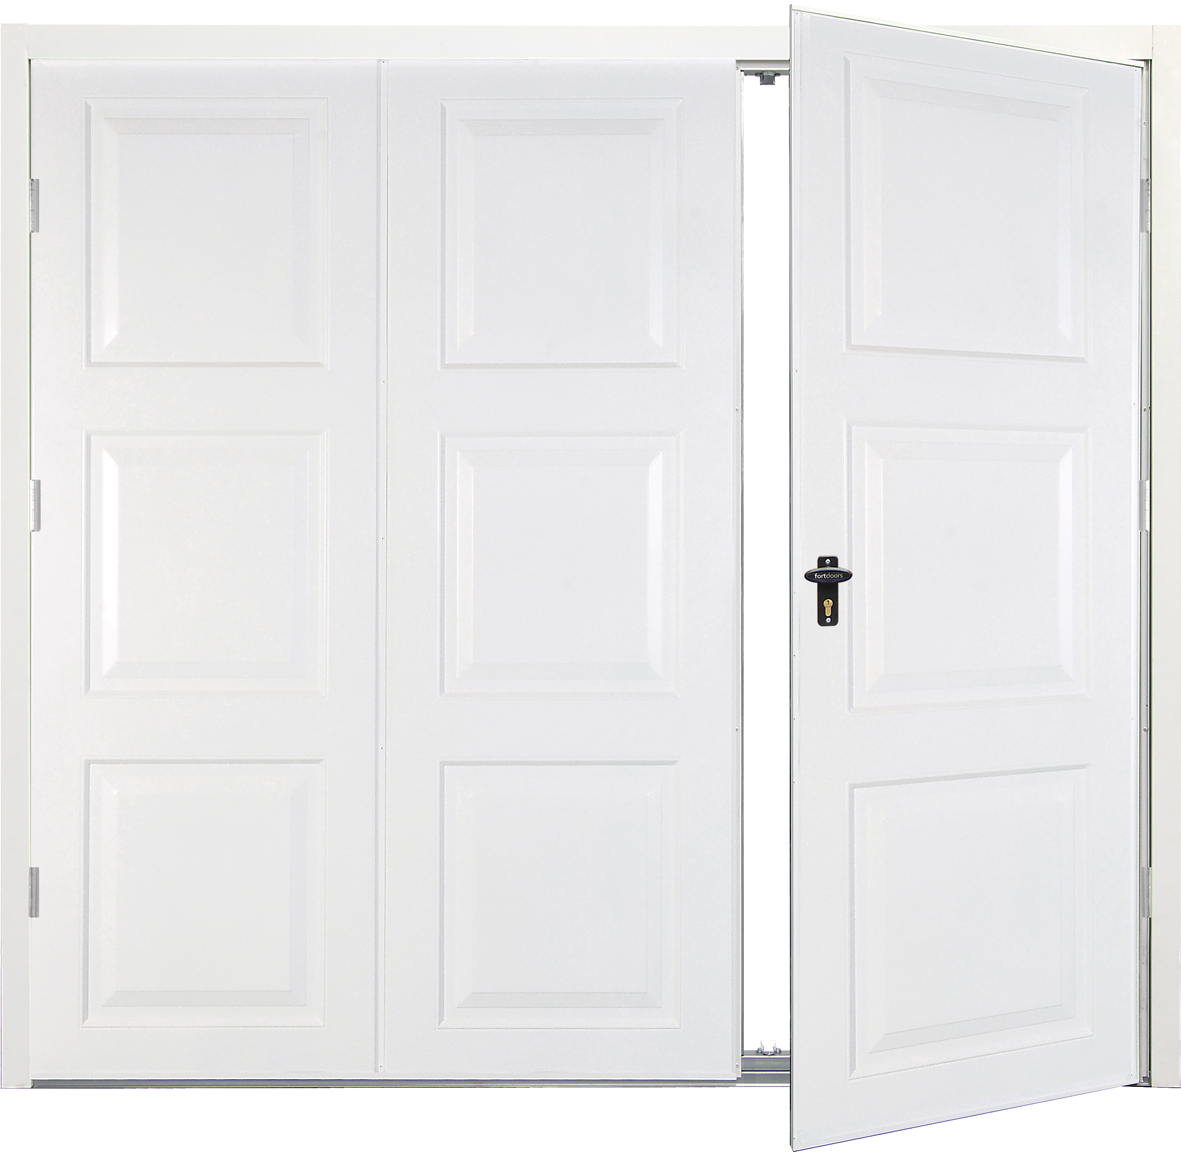 Timber Upvc Steel Side Hinged Garage Doors Prices